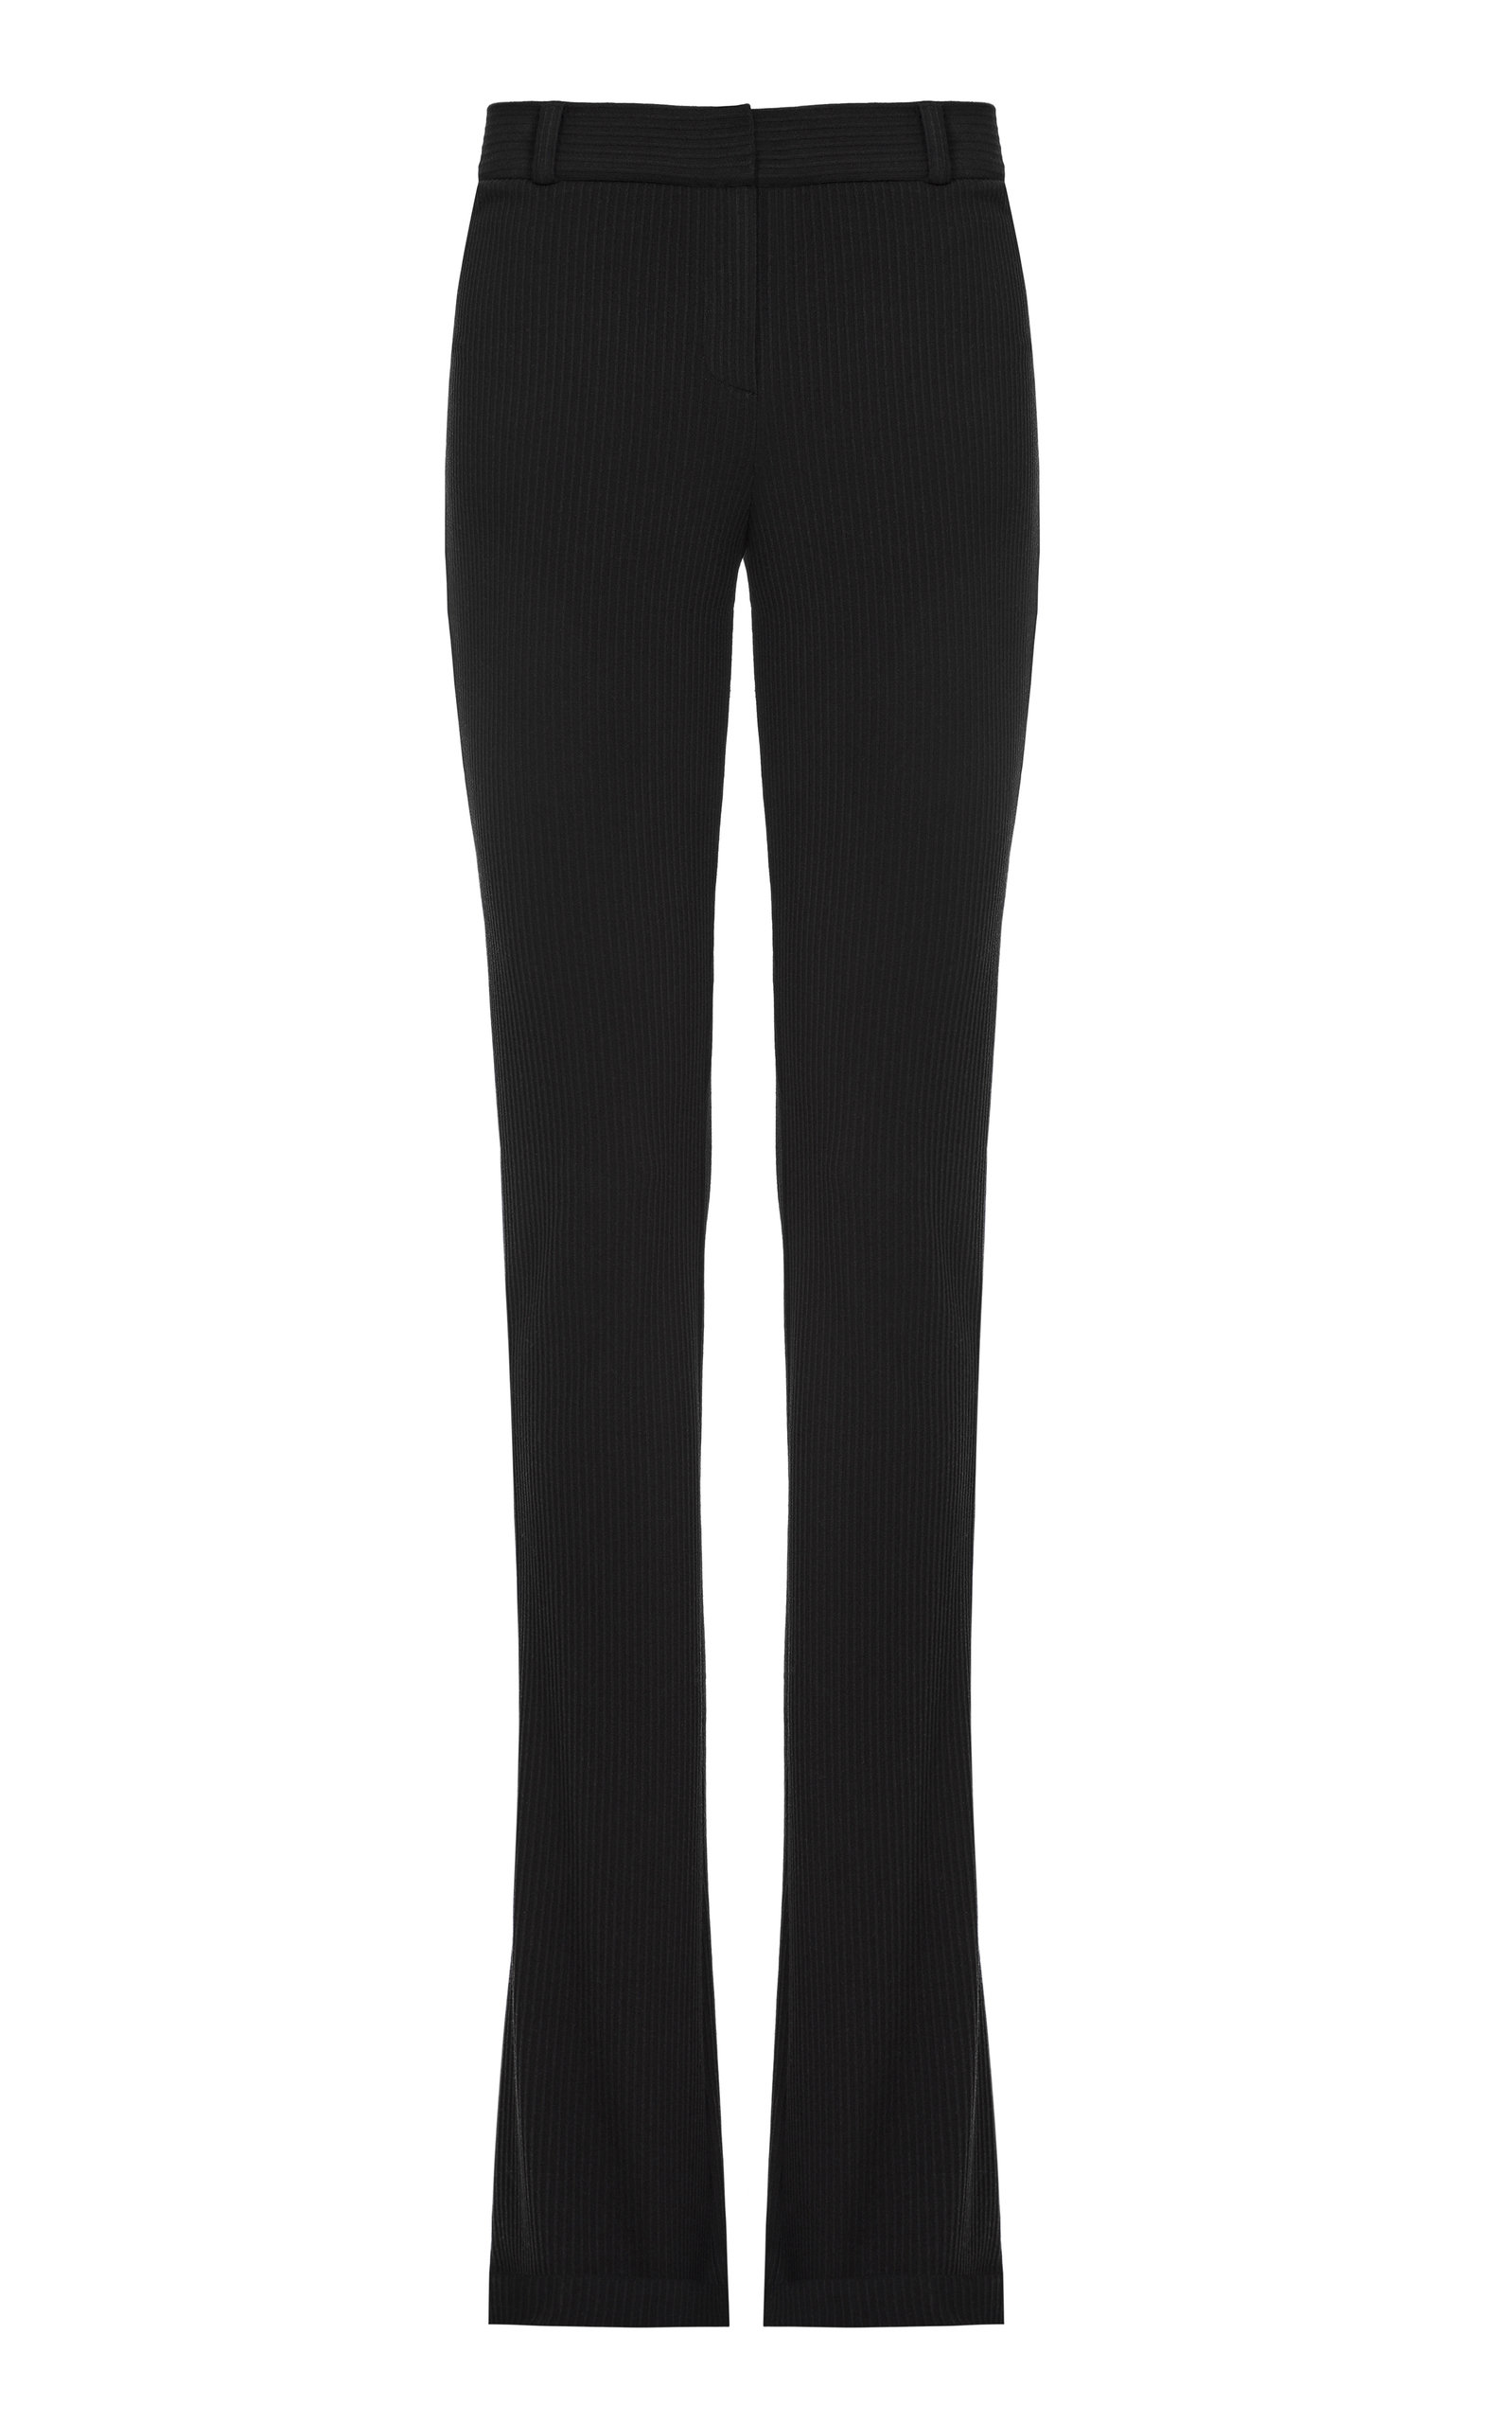 Women's Stretchy Bouclé Straight-Leg Pants